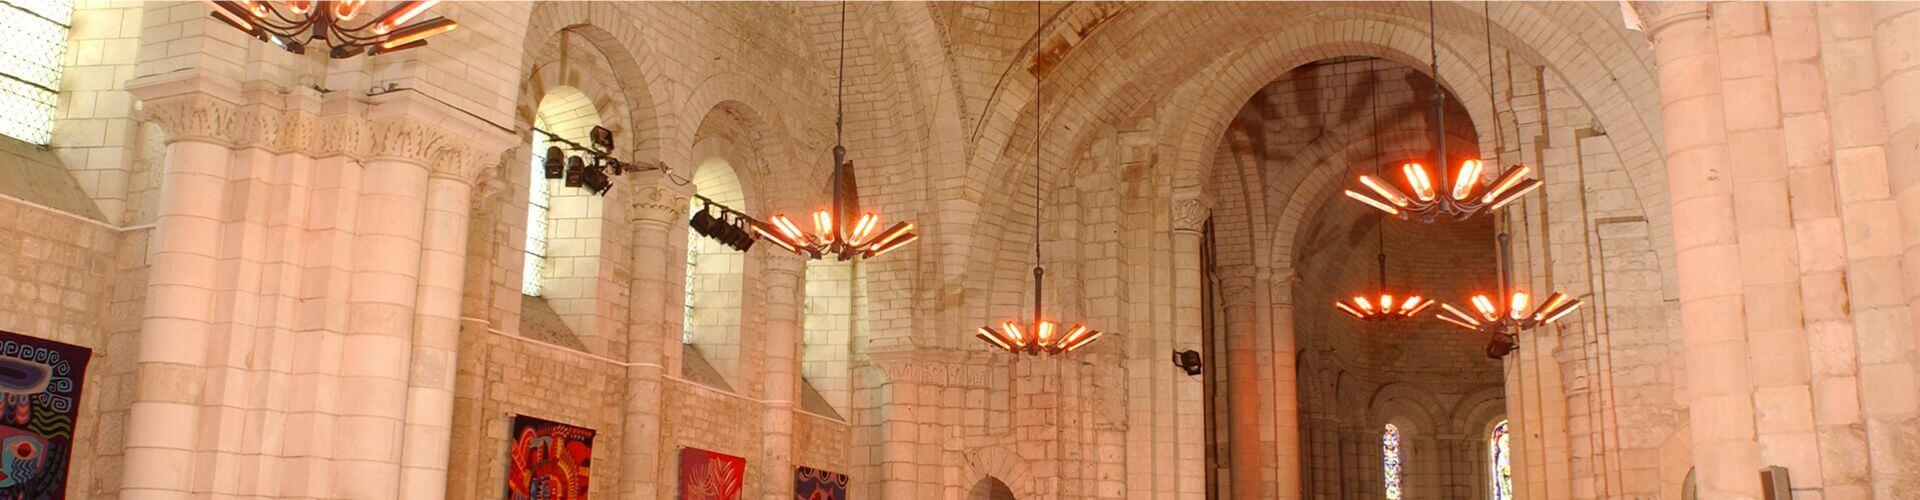 fenice-chiese-riscaldamento-infrarossi